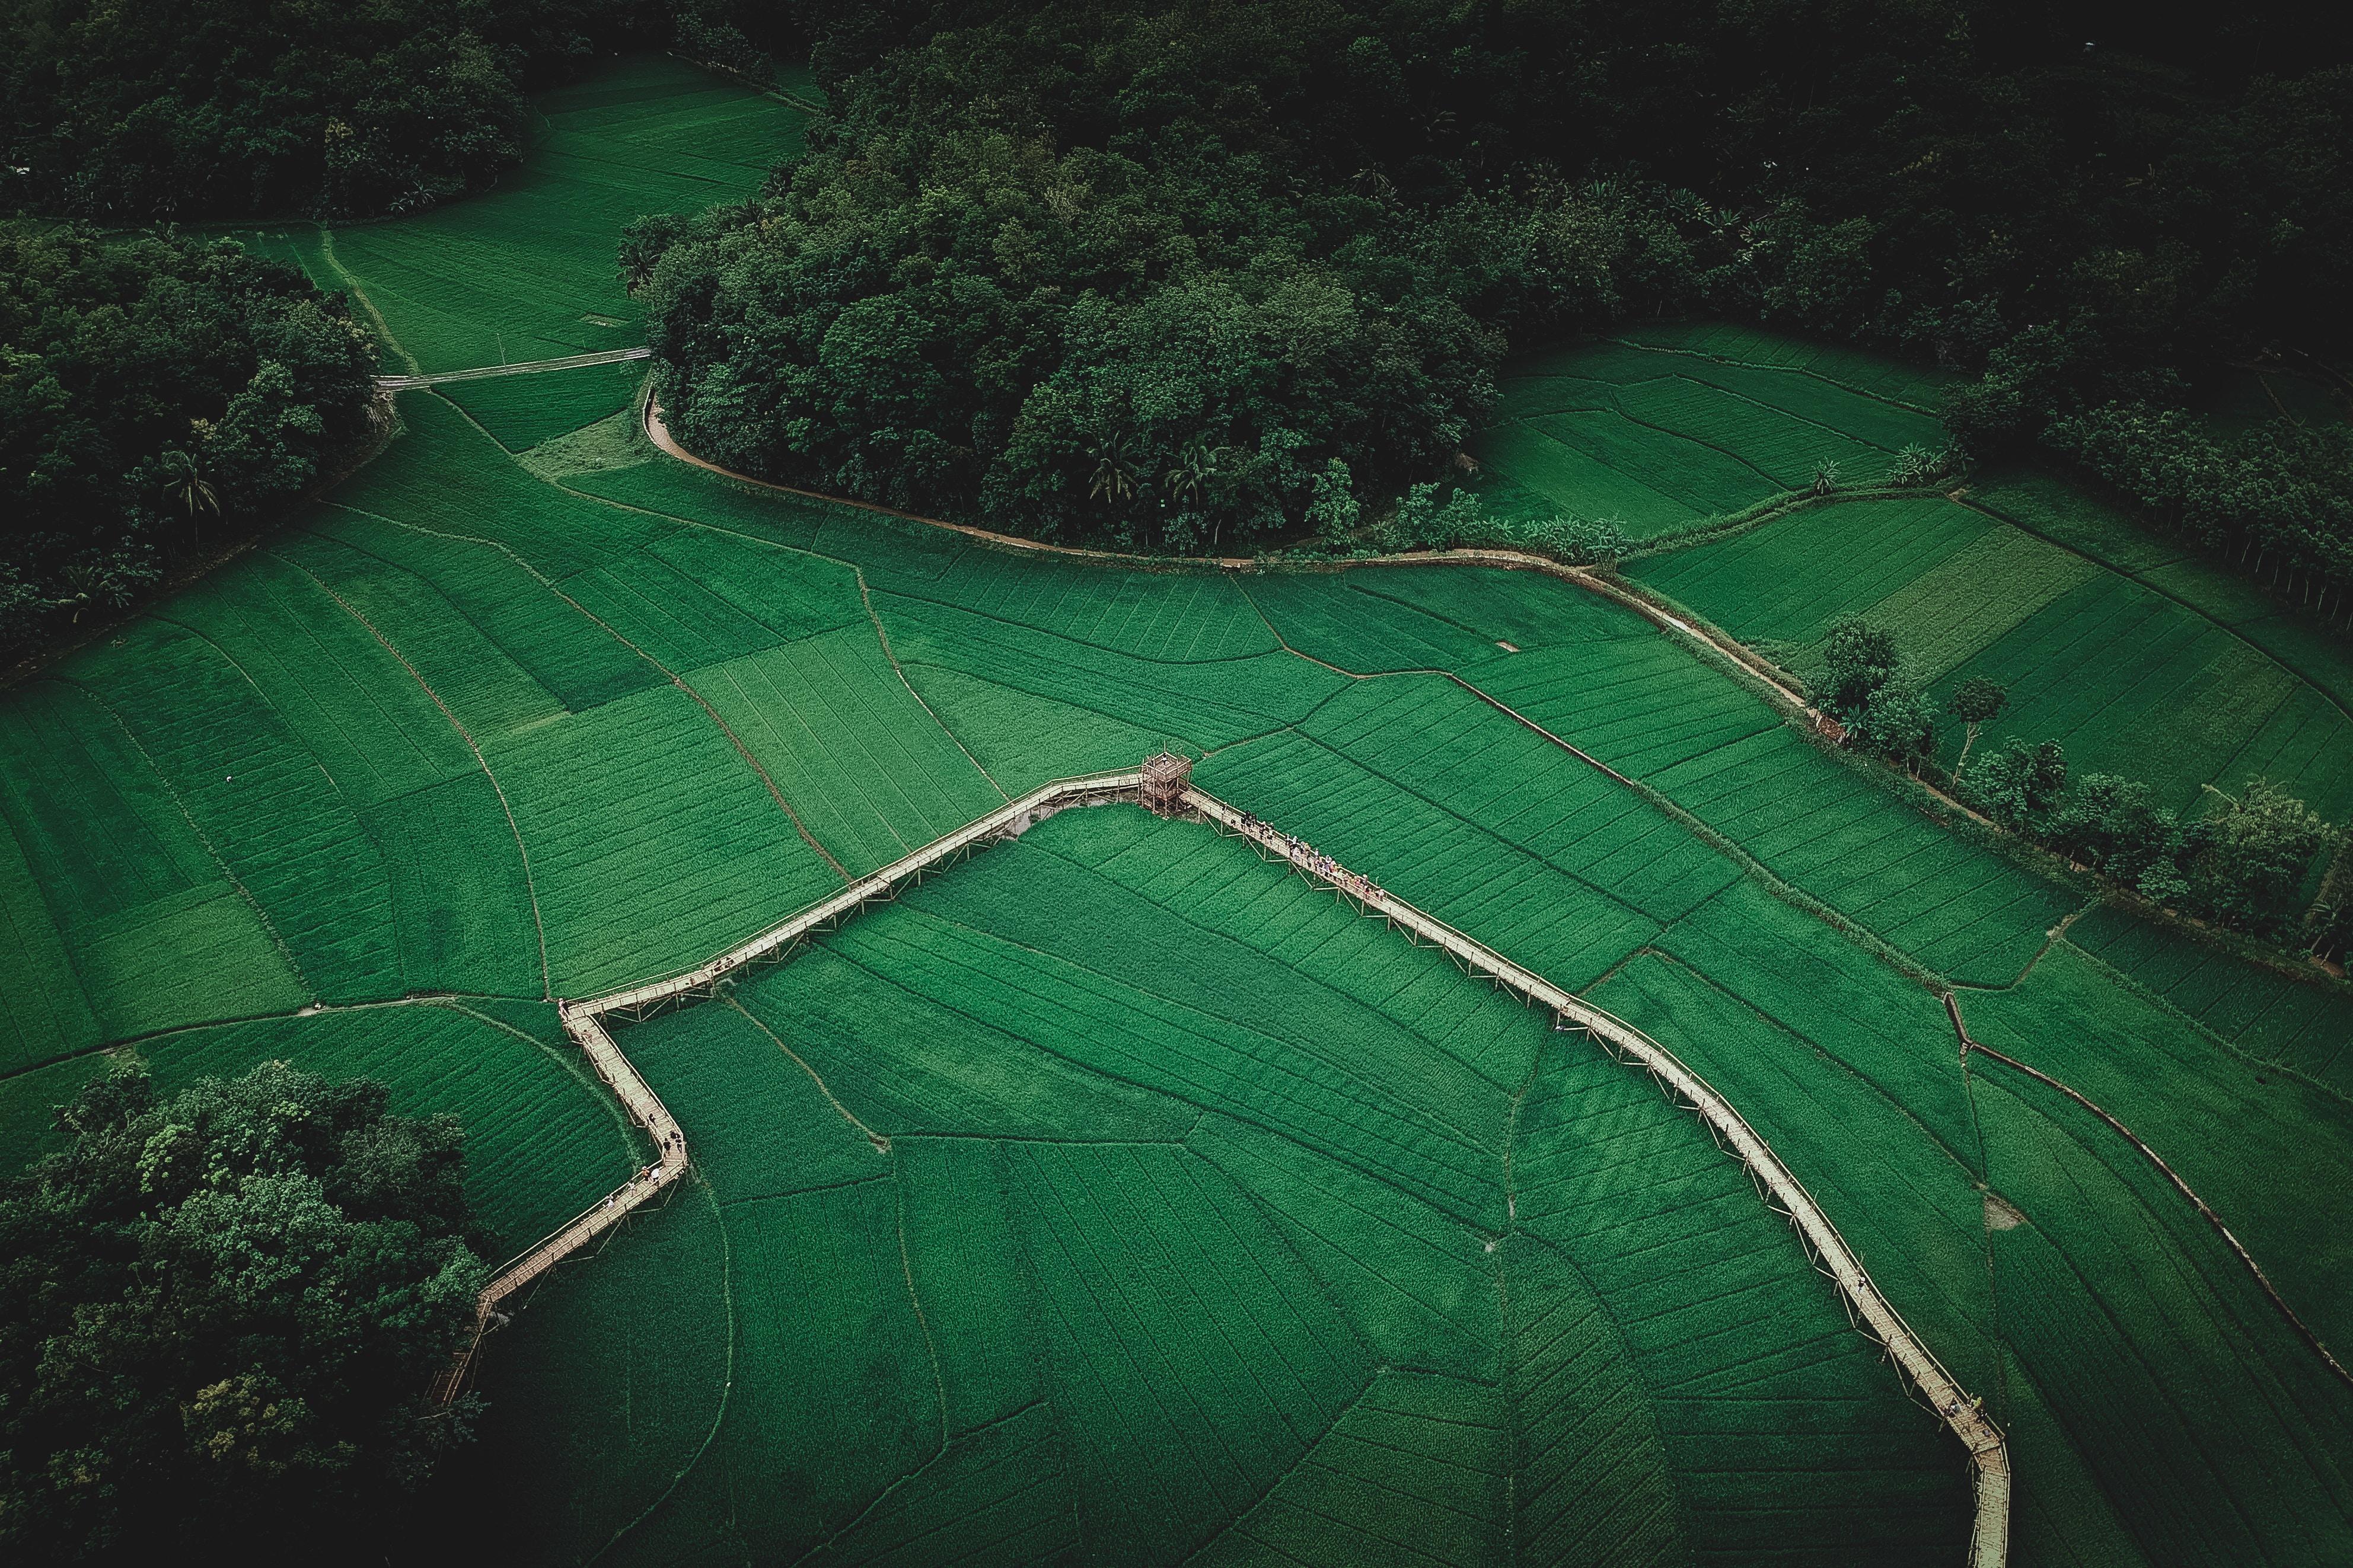 birds eye view of field